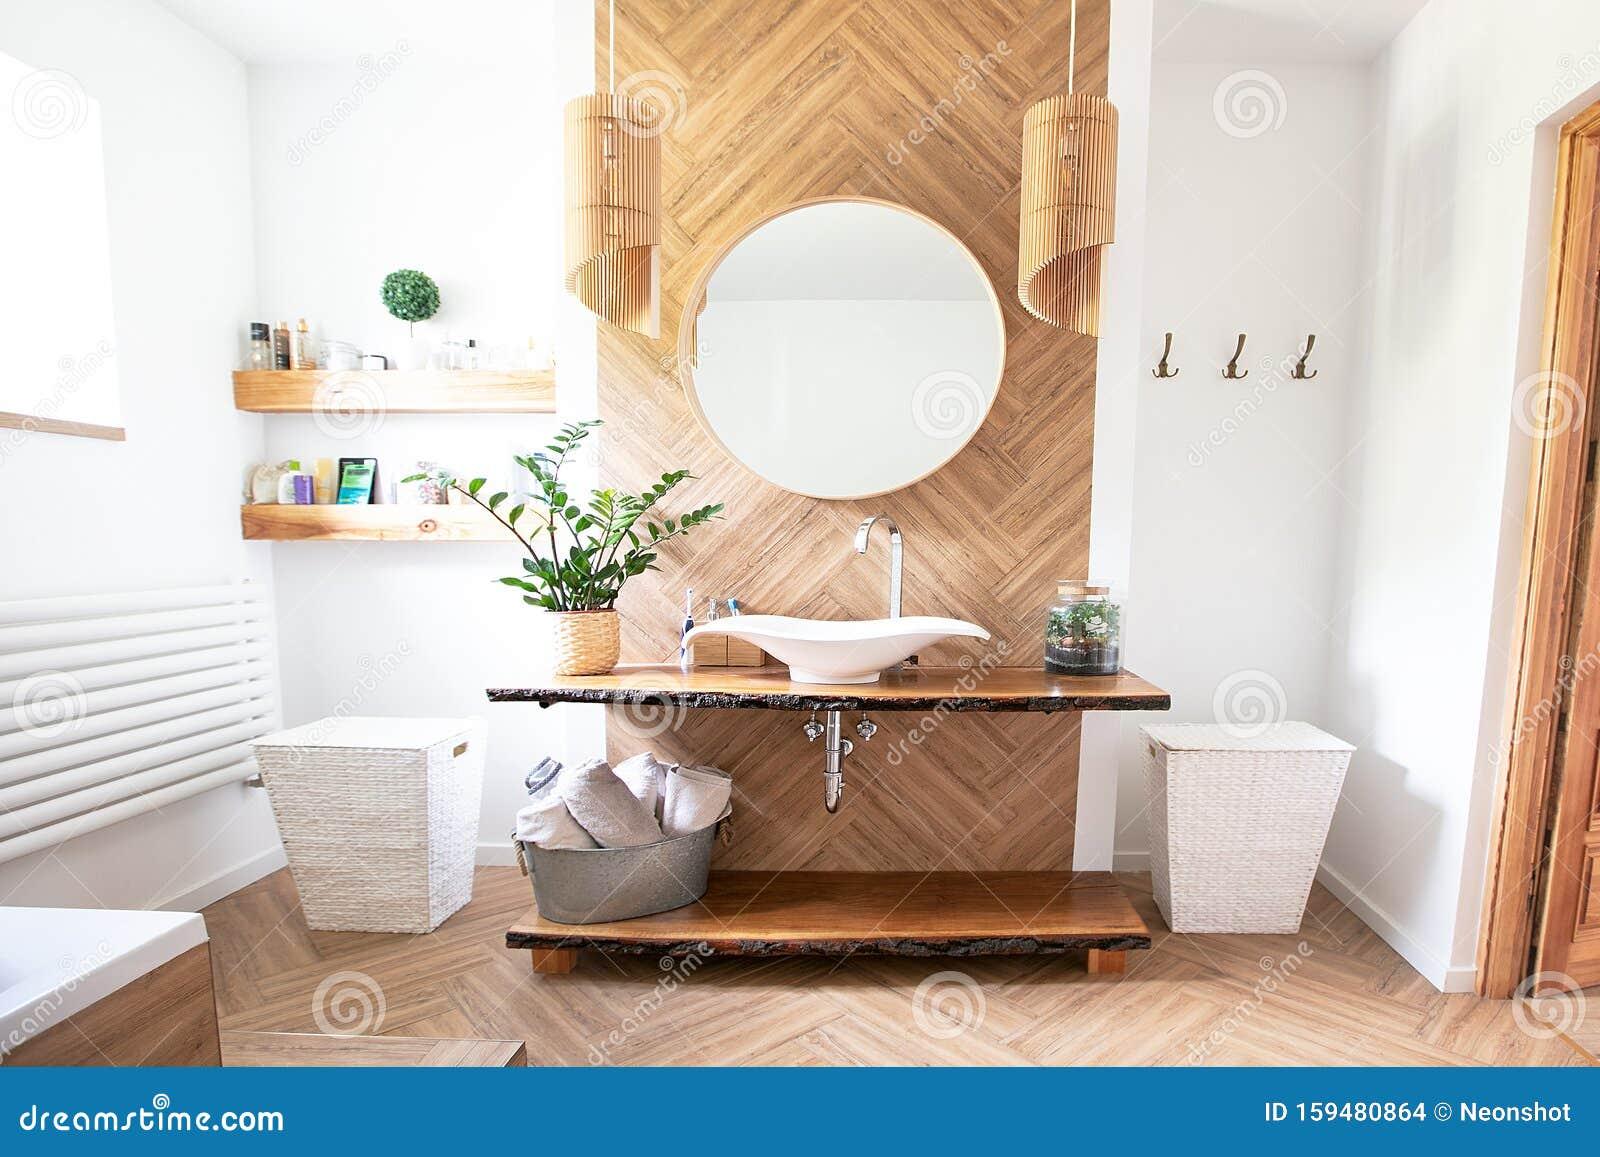 Boho Style Bathroom Interior Stock Photo   Image of estate ...